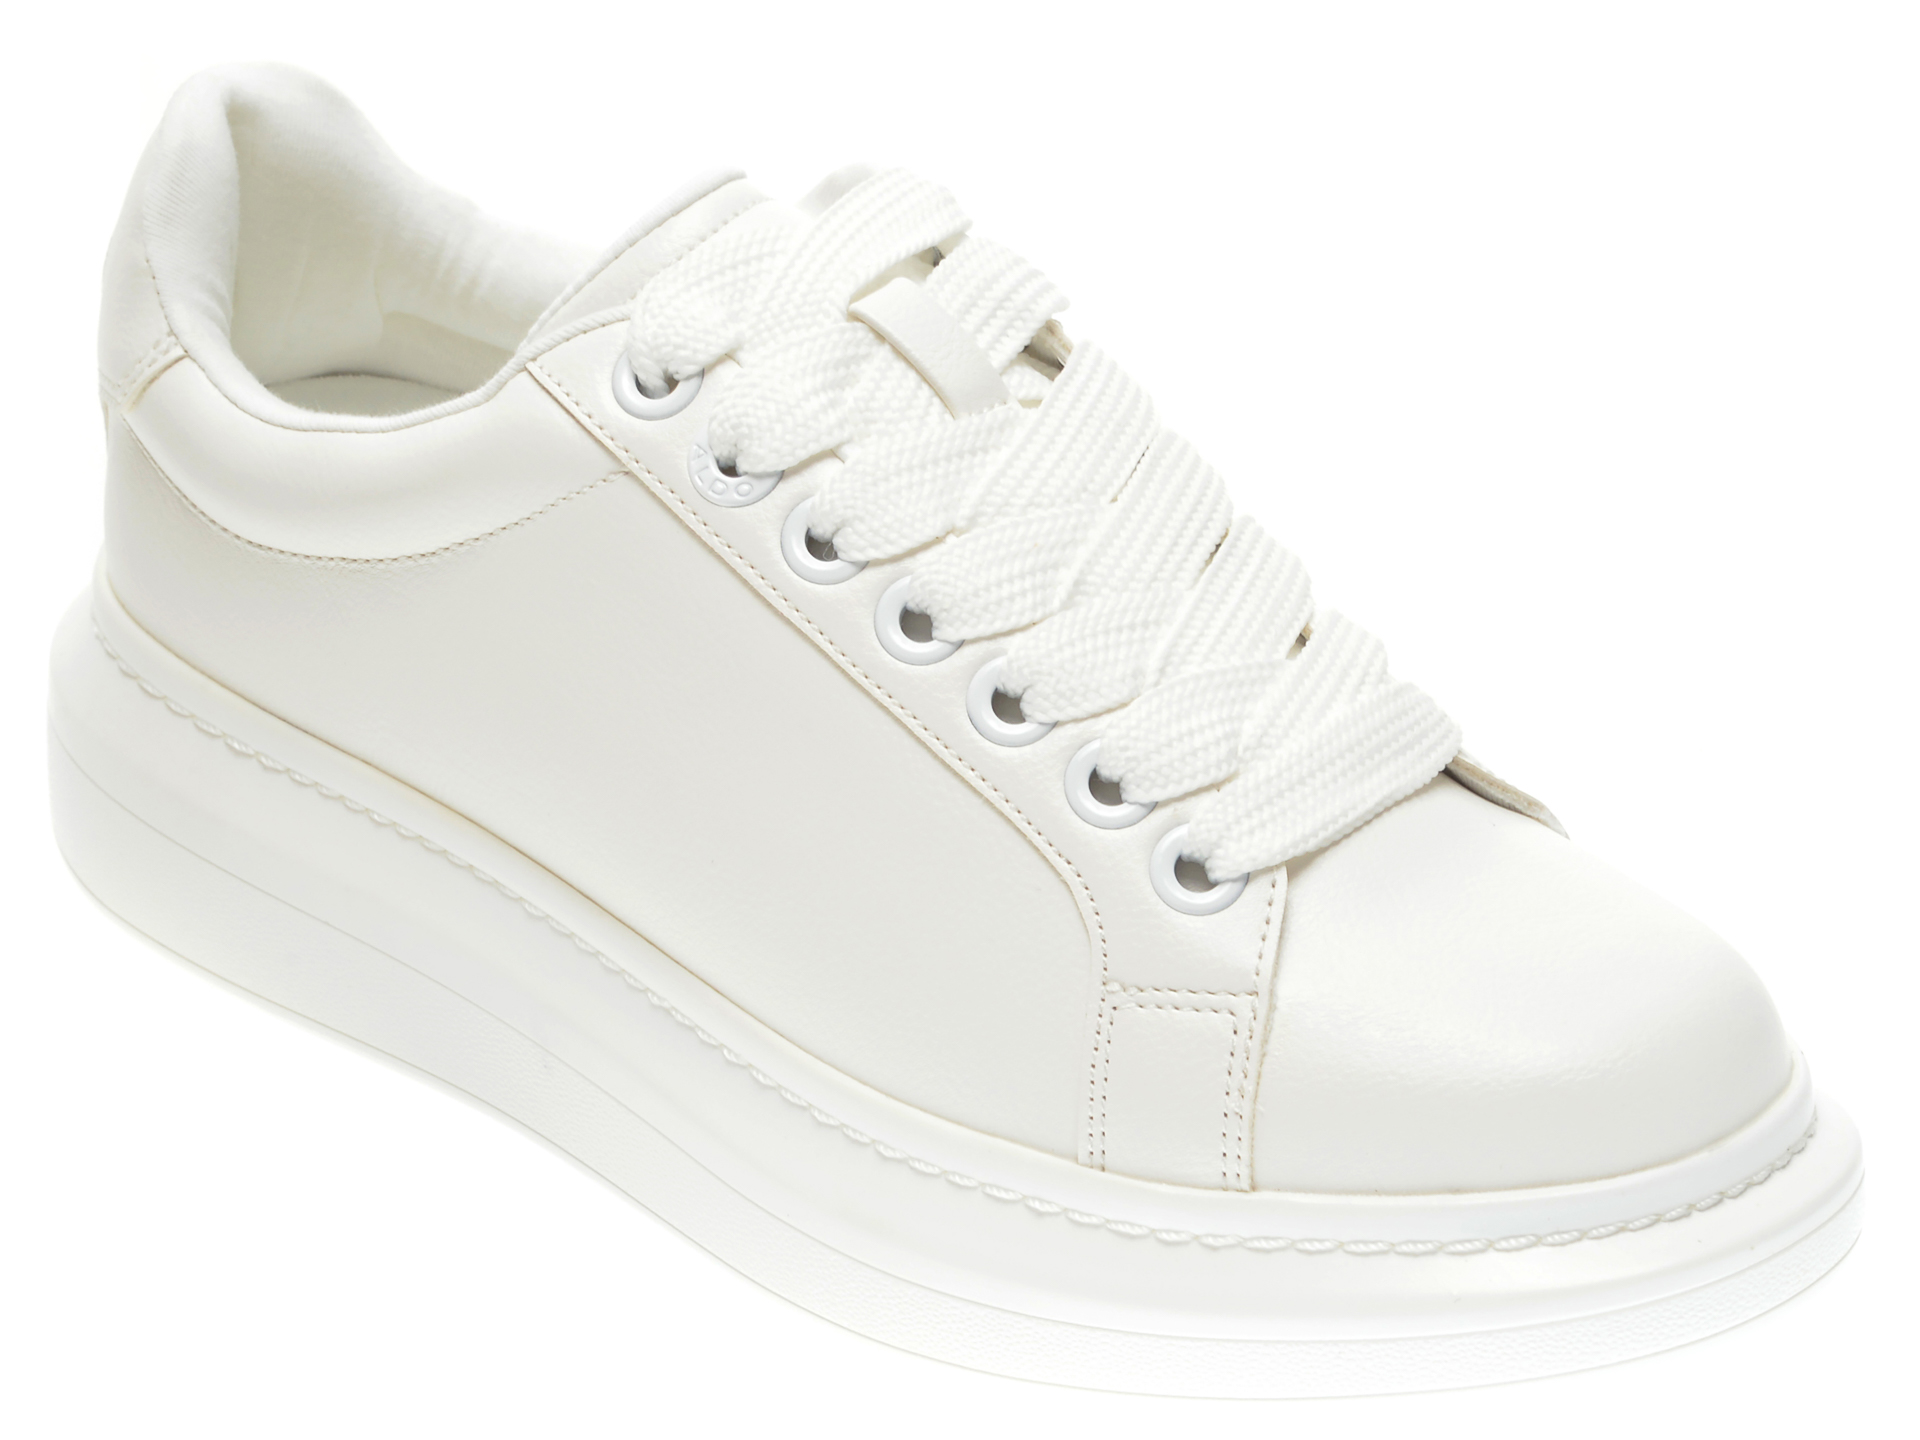 Pantofi Sport Aldo Albi, Retamoza100, Din Piele Ecologica